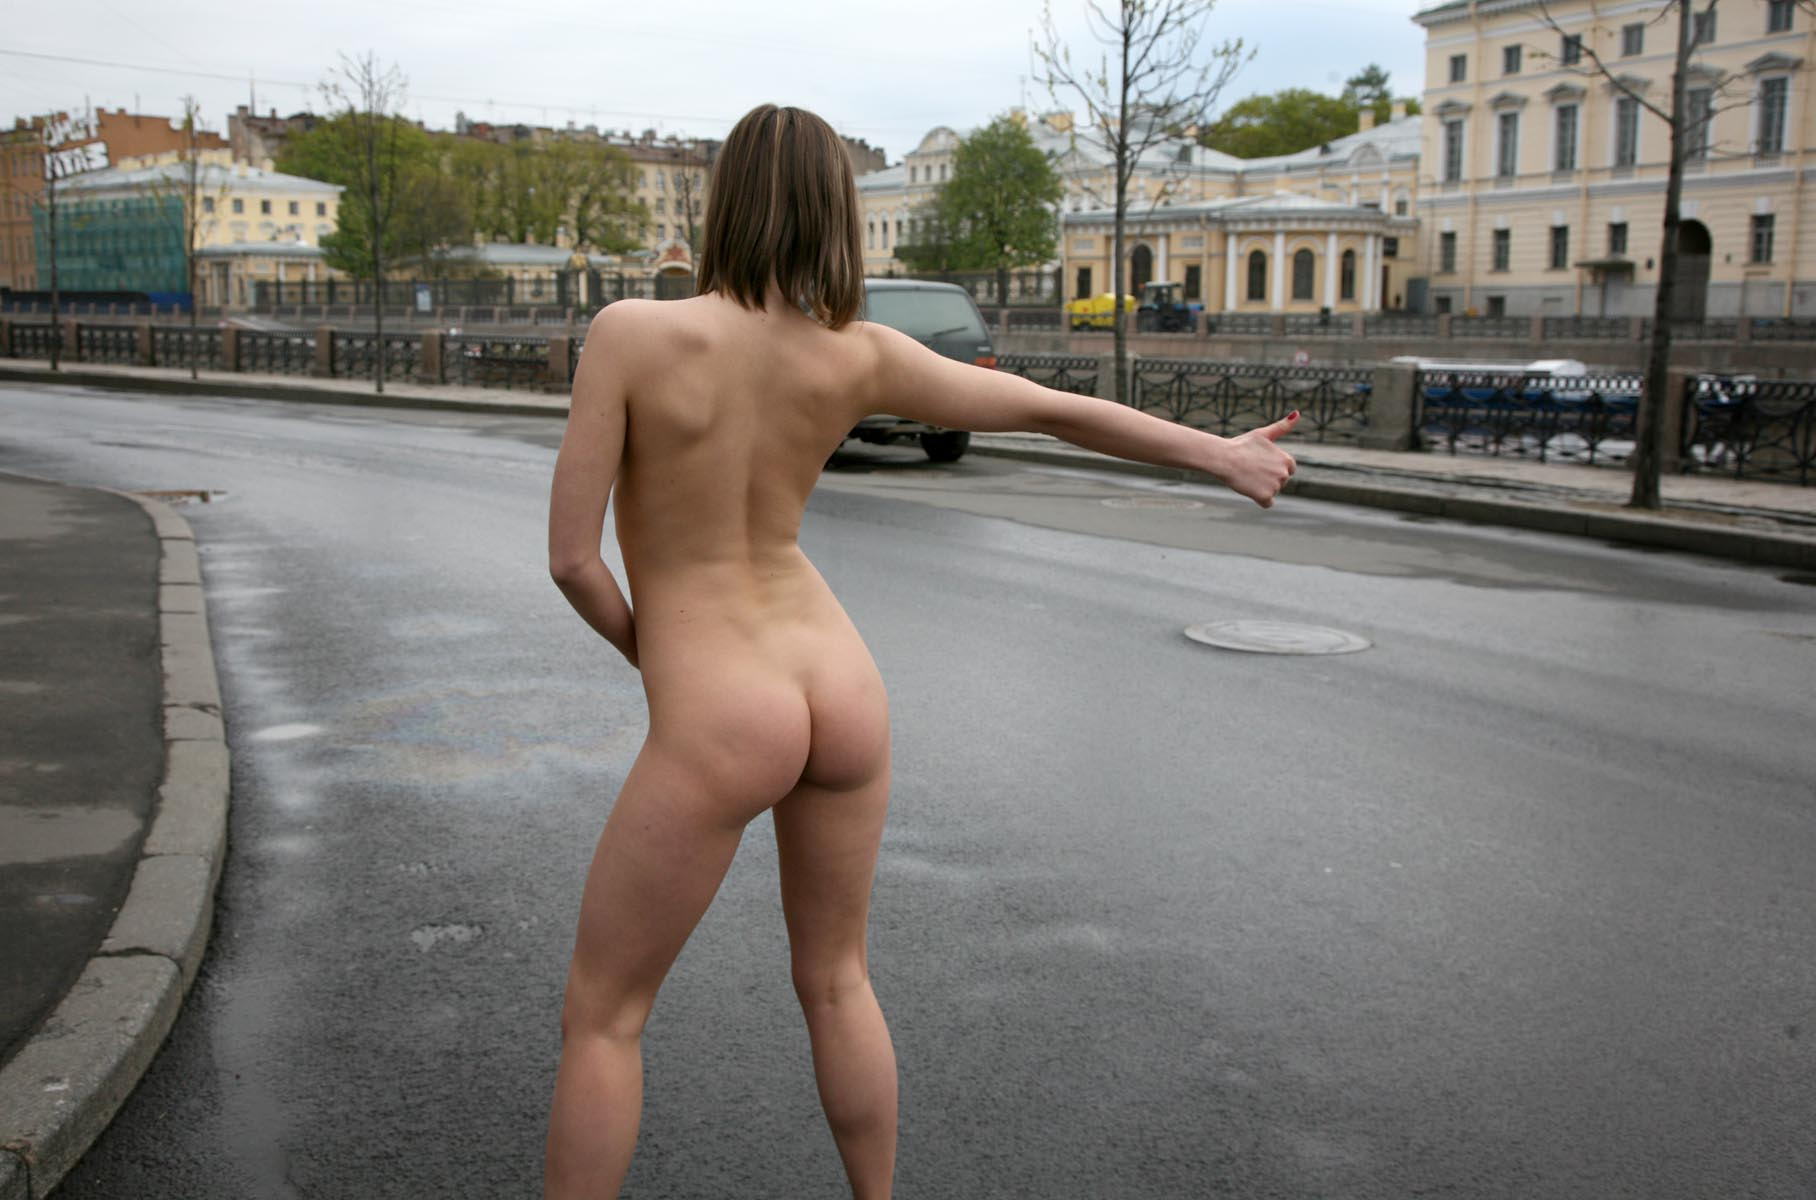 seks-lizbiyanki-chastnoe-eroticheskoe-foto-na-ulitse-super